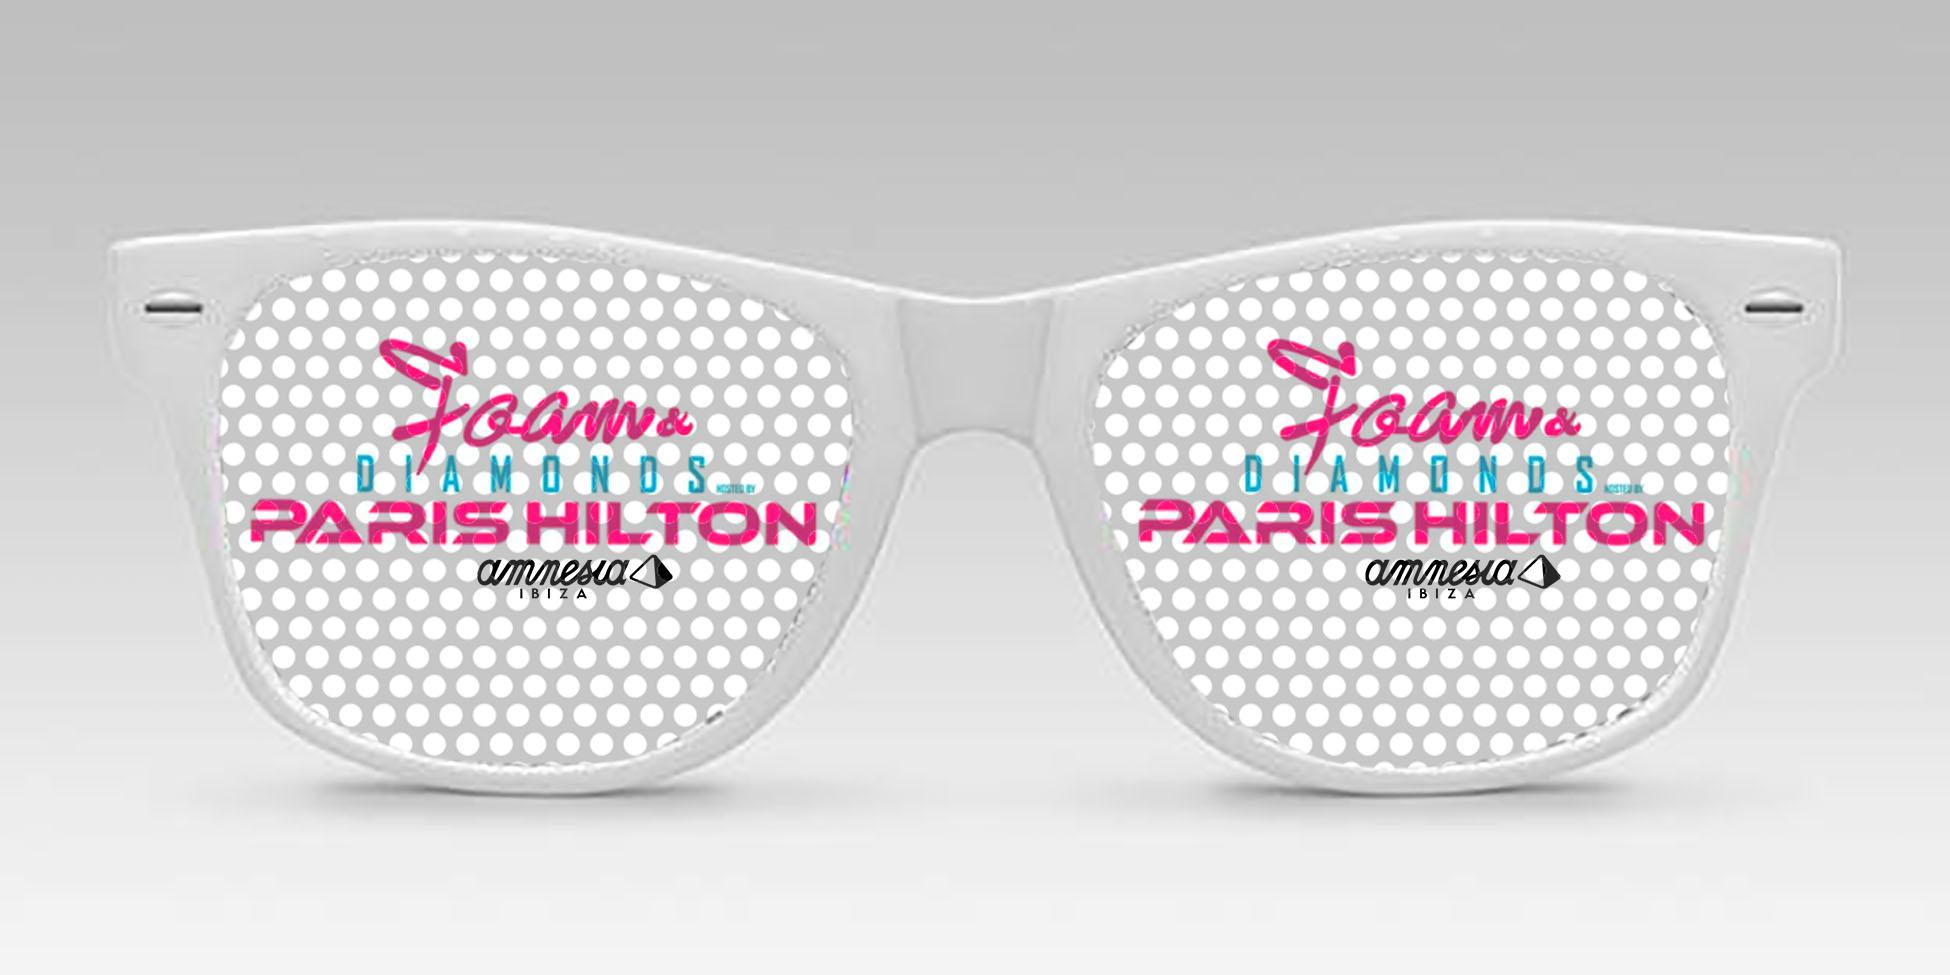 9-PH_sunglasses.jpg